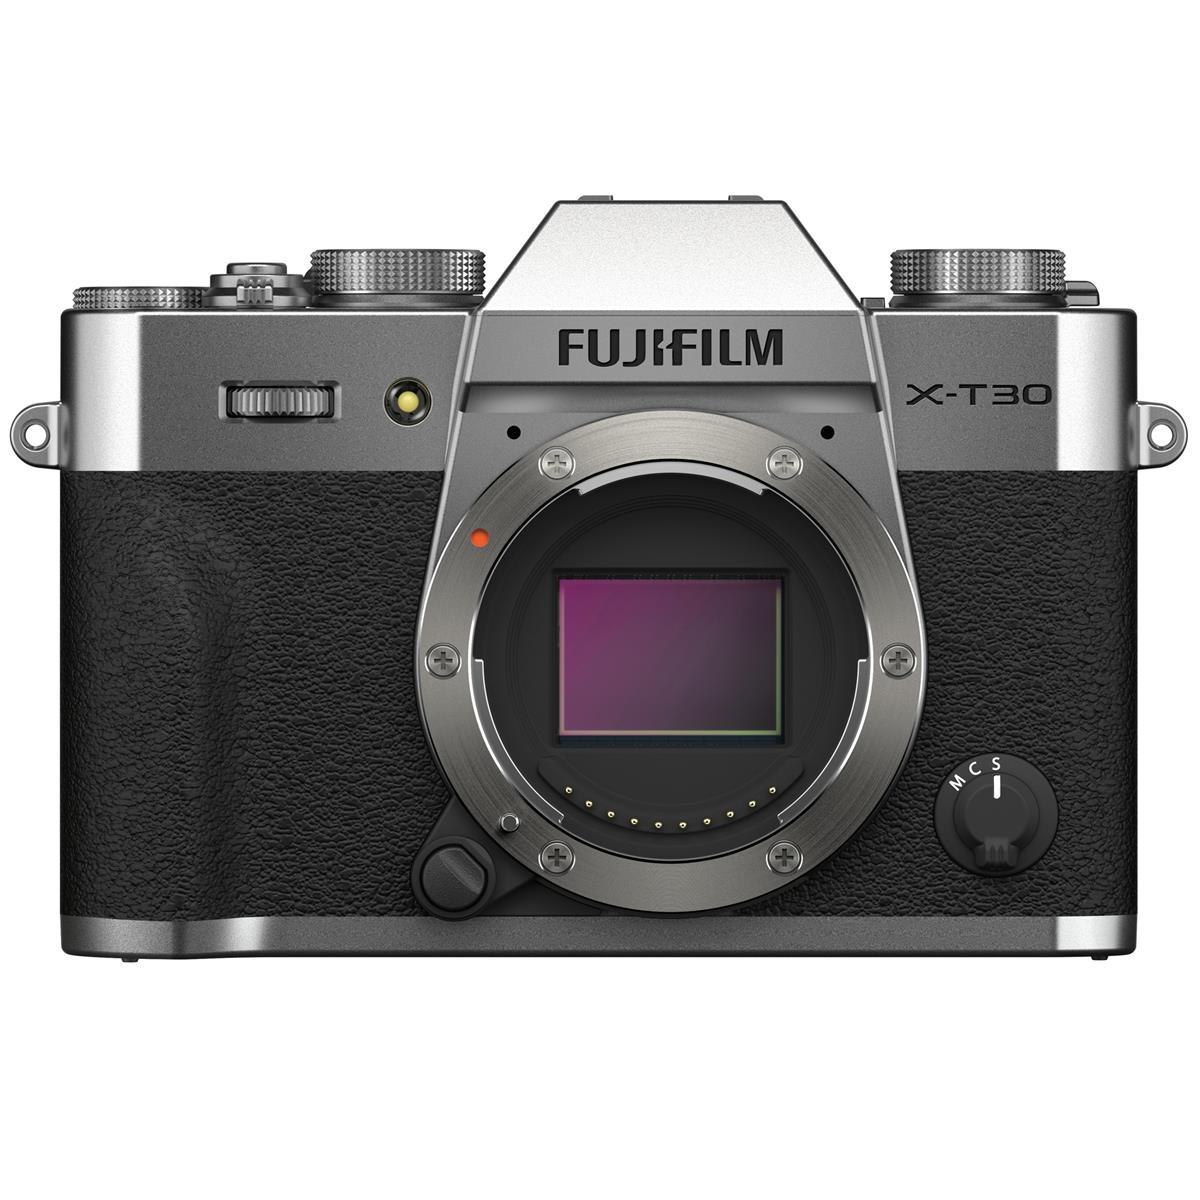 Fujifilm X-T30 II Mirrorless Camera Body (Silver)